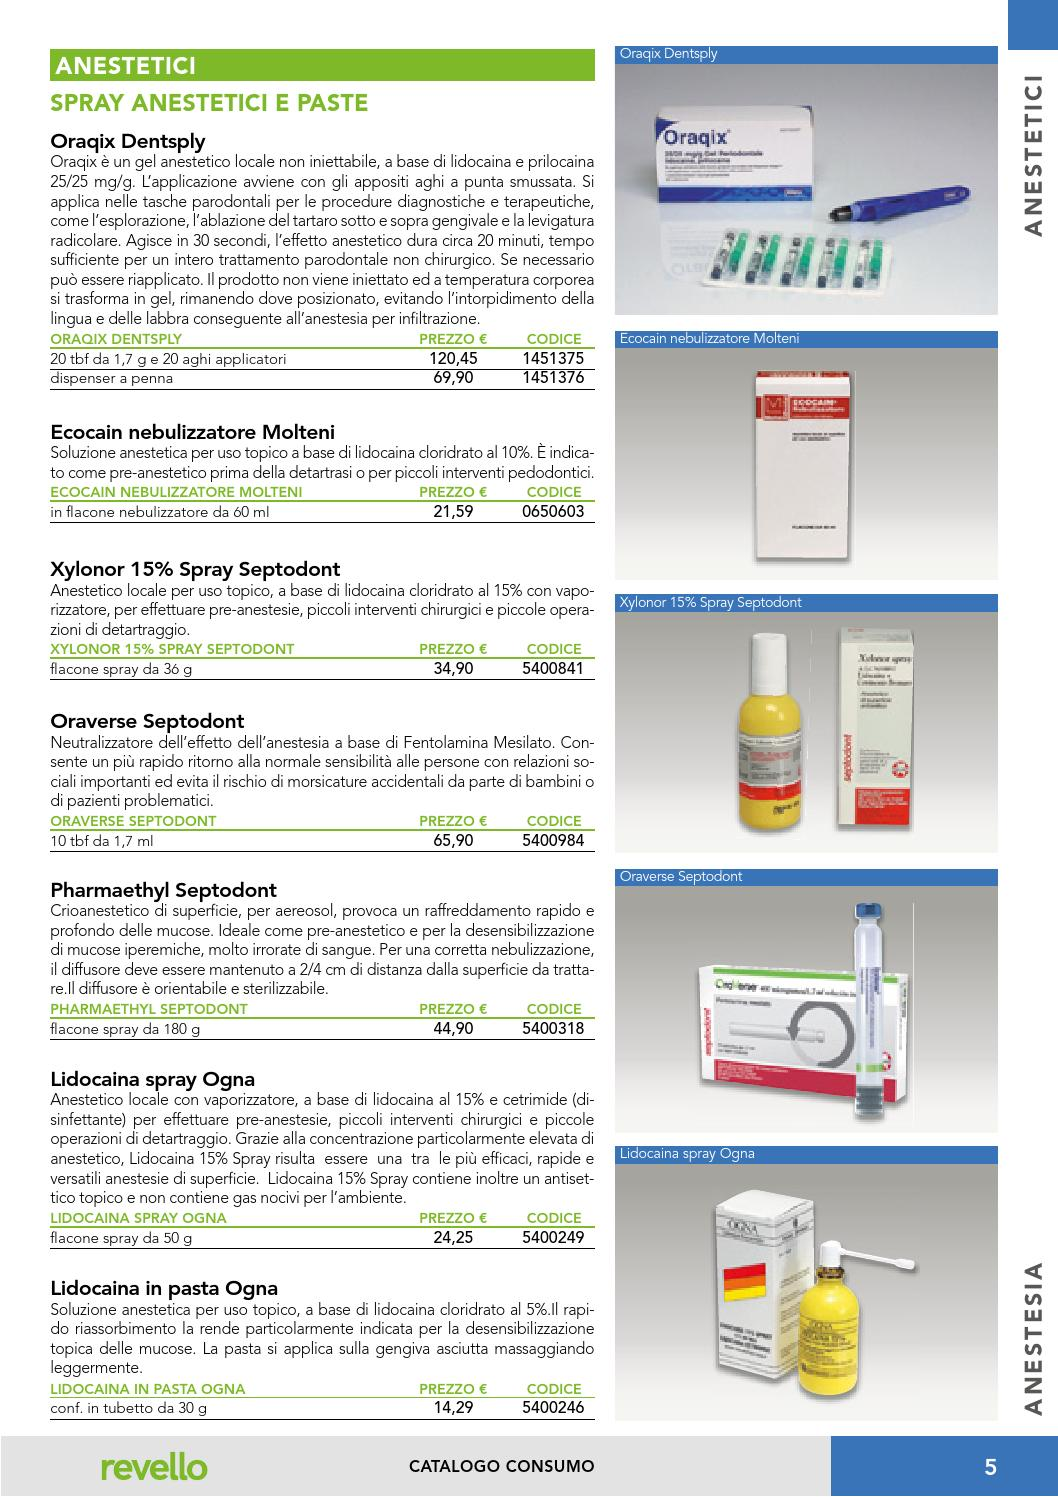 Cloridrato de lidocaina uso topico